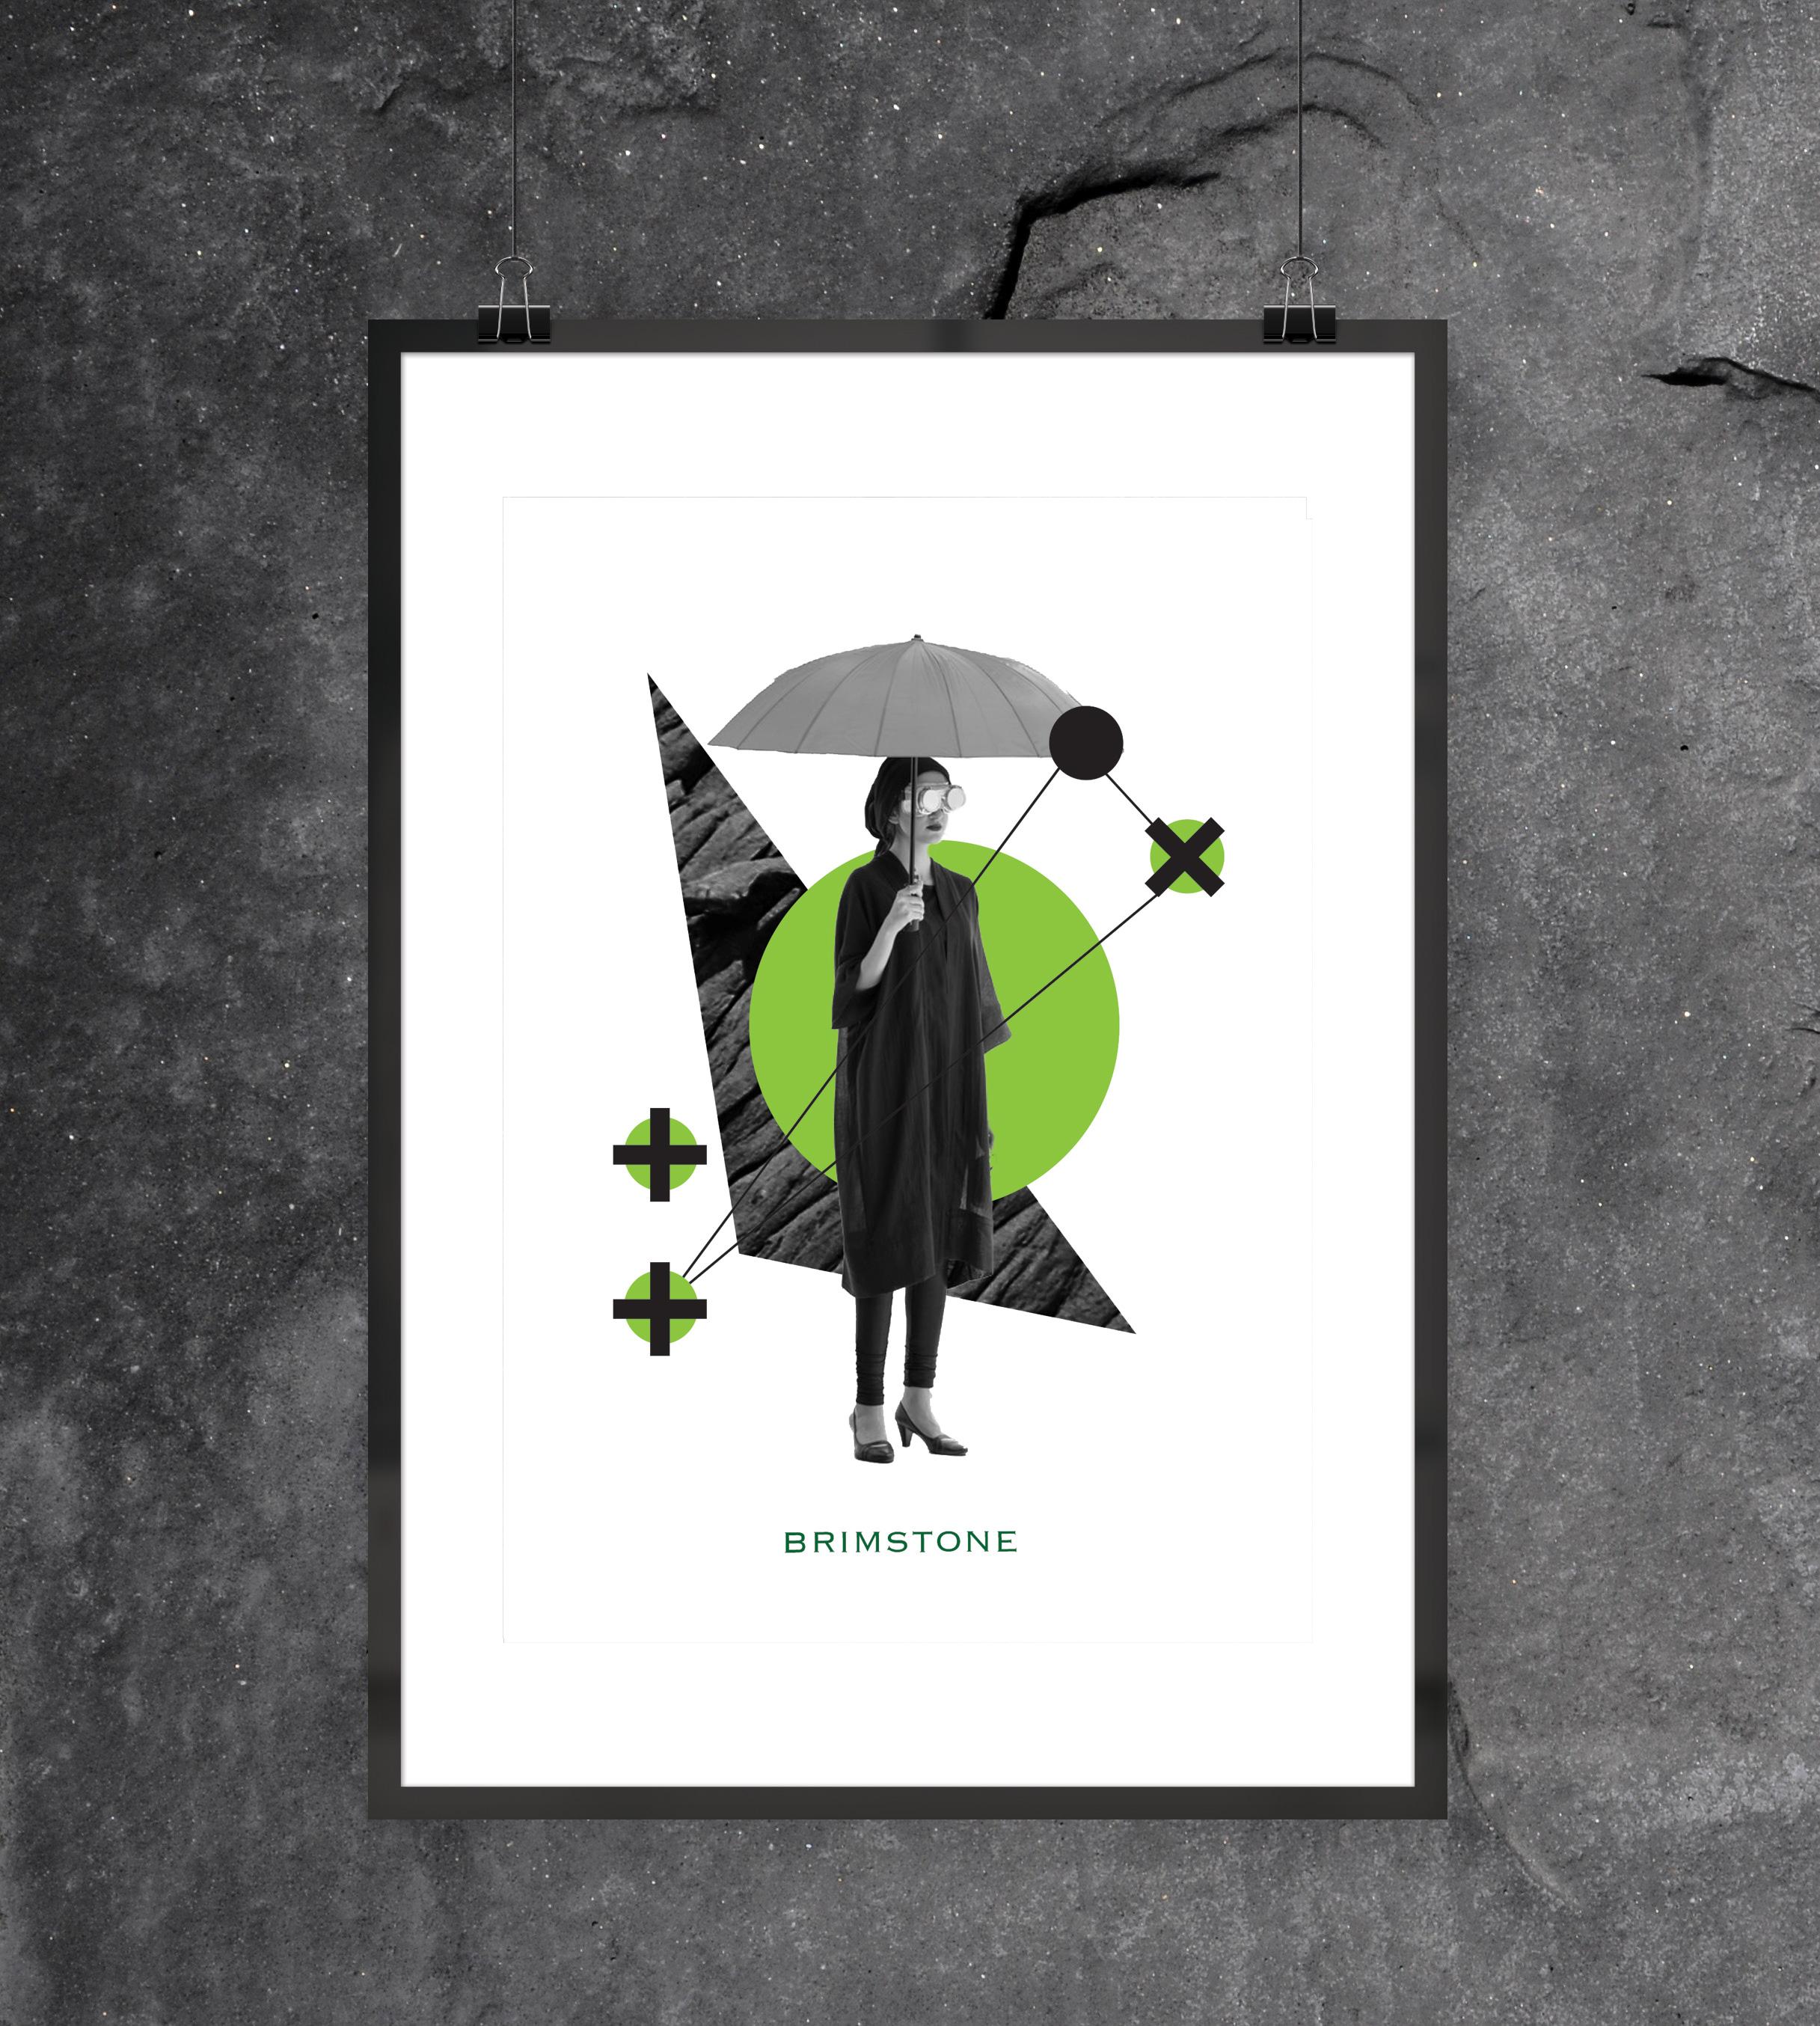 Brimstone-Poster.jpg